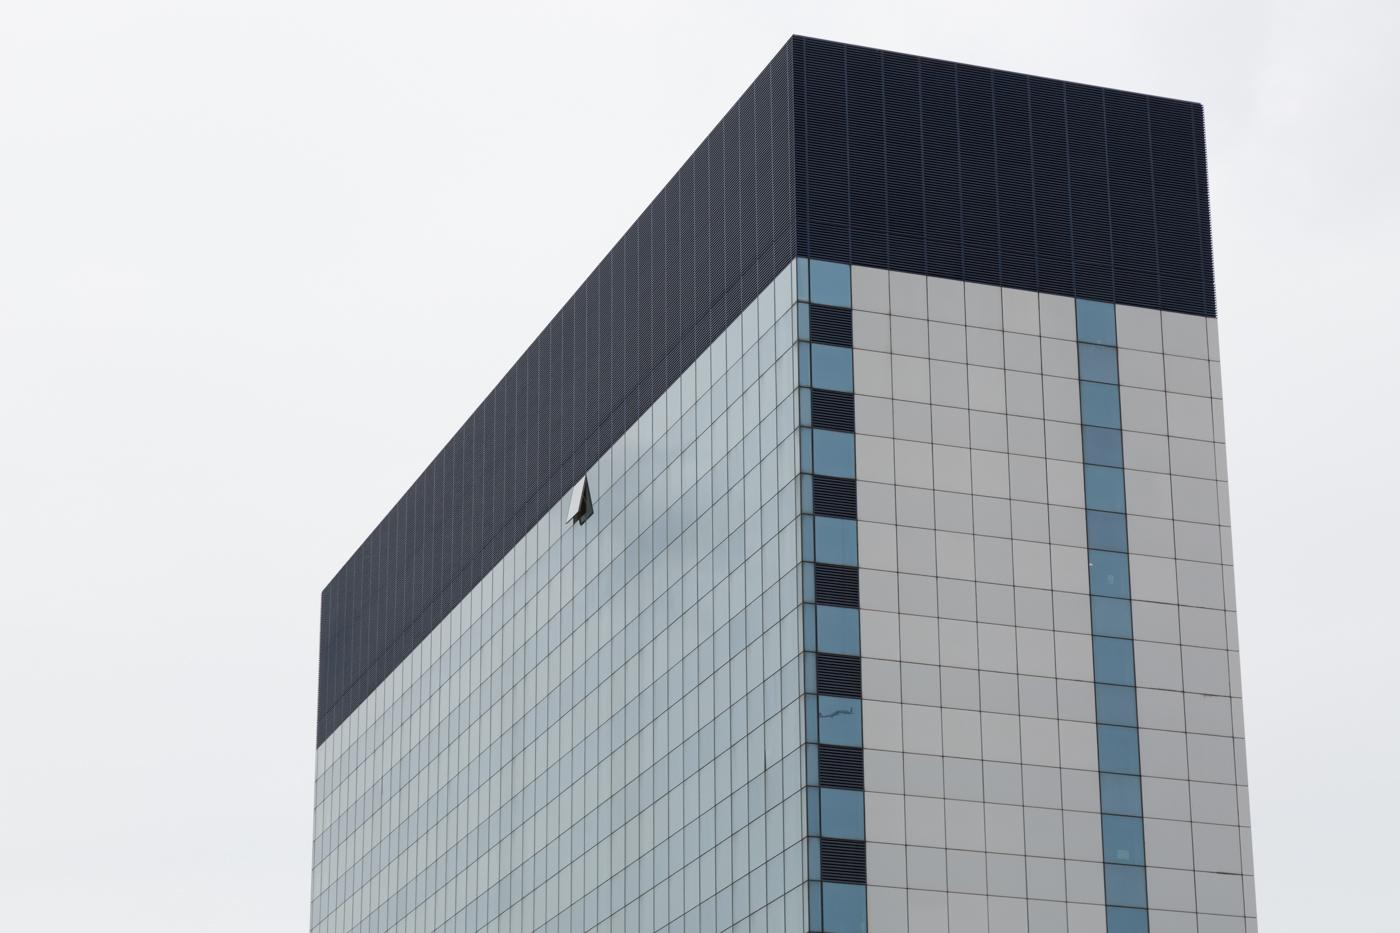 London shape glass building